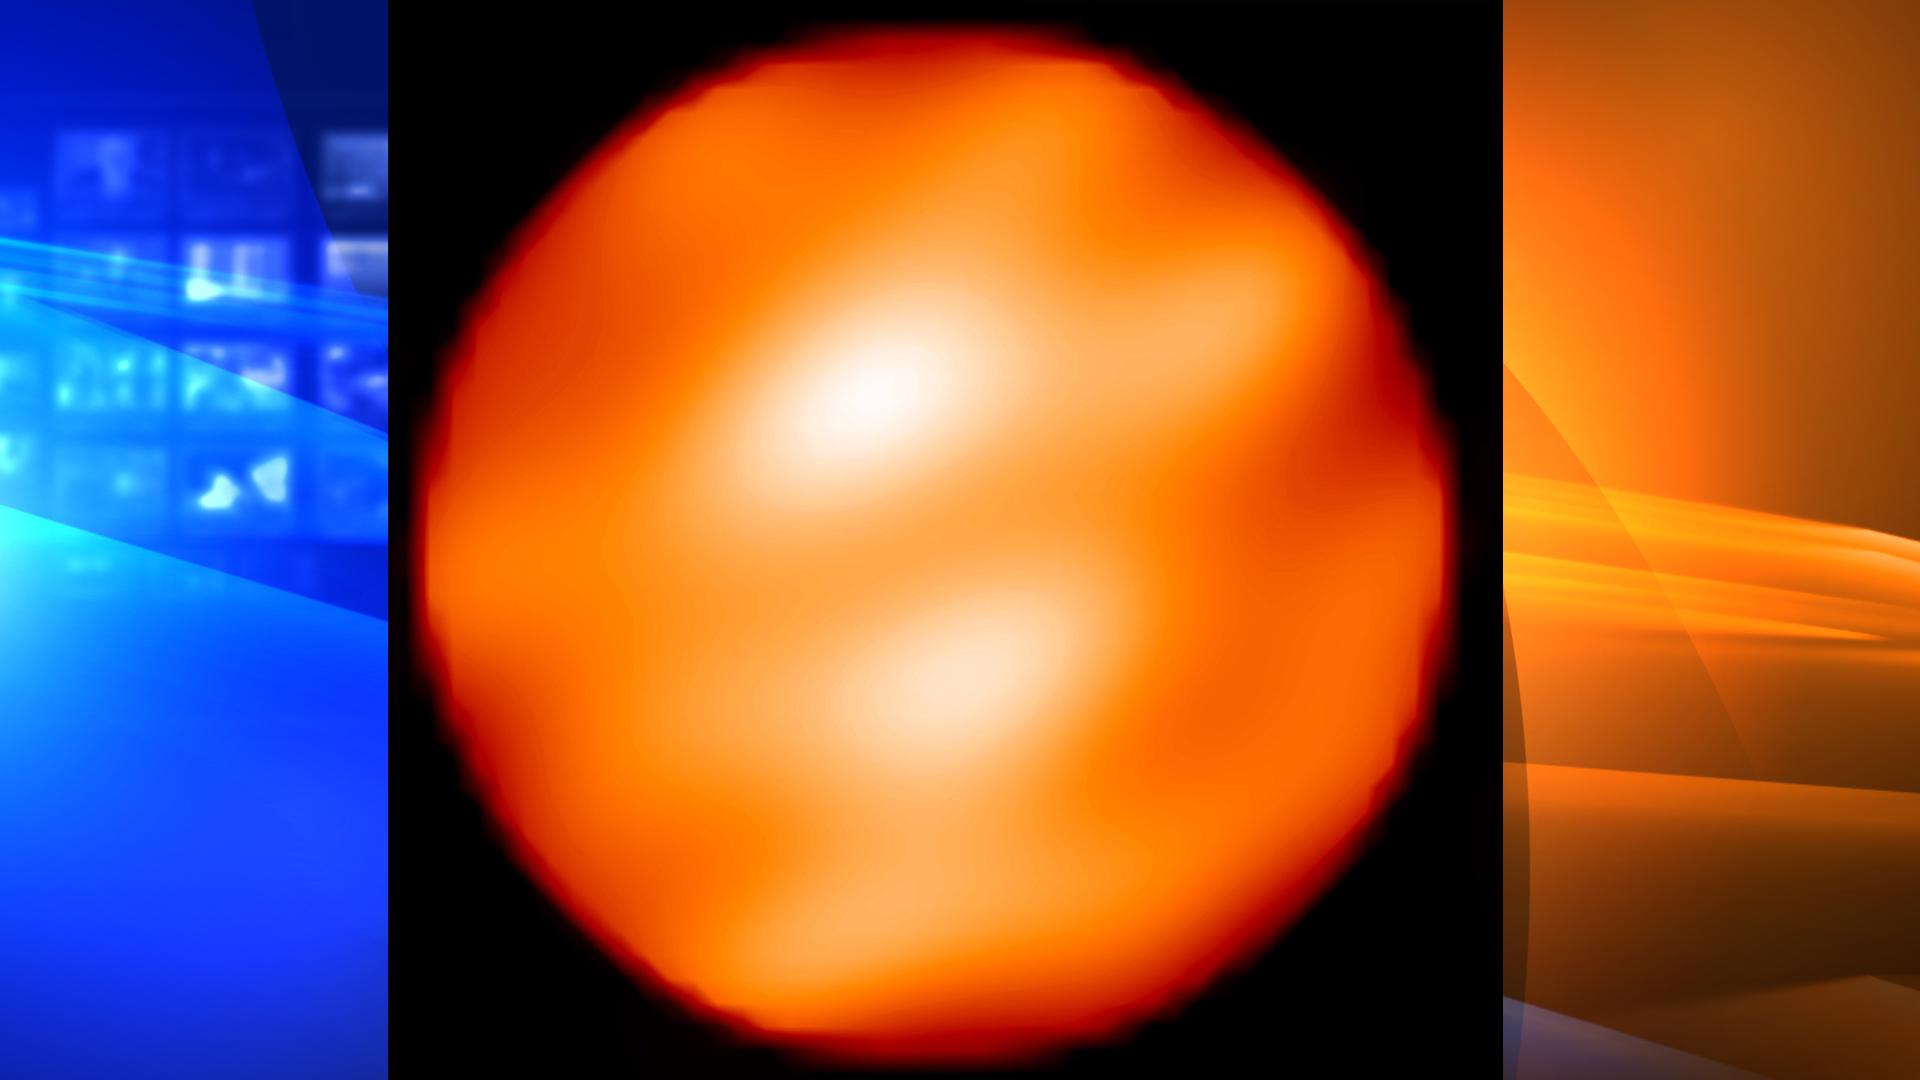 Giant red star, Betelgeus, on Jan. 6, 2010. (Credit: NASA)